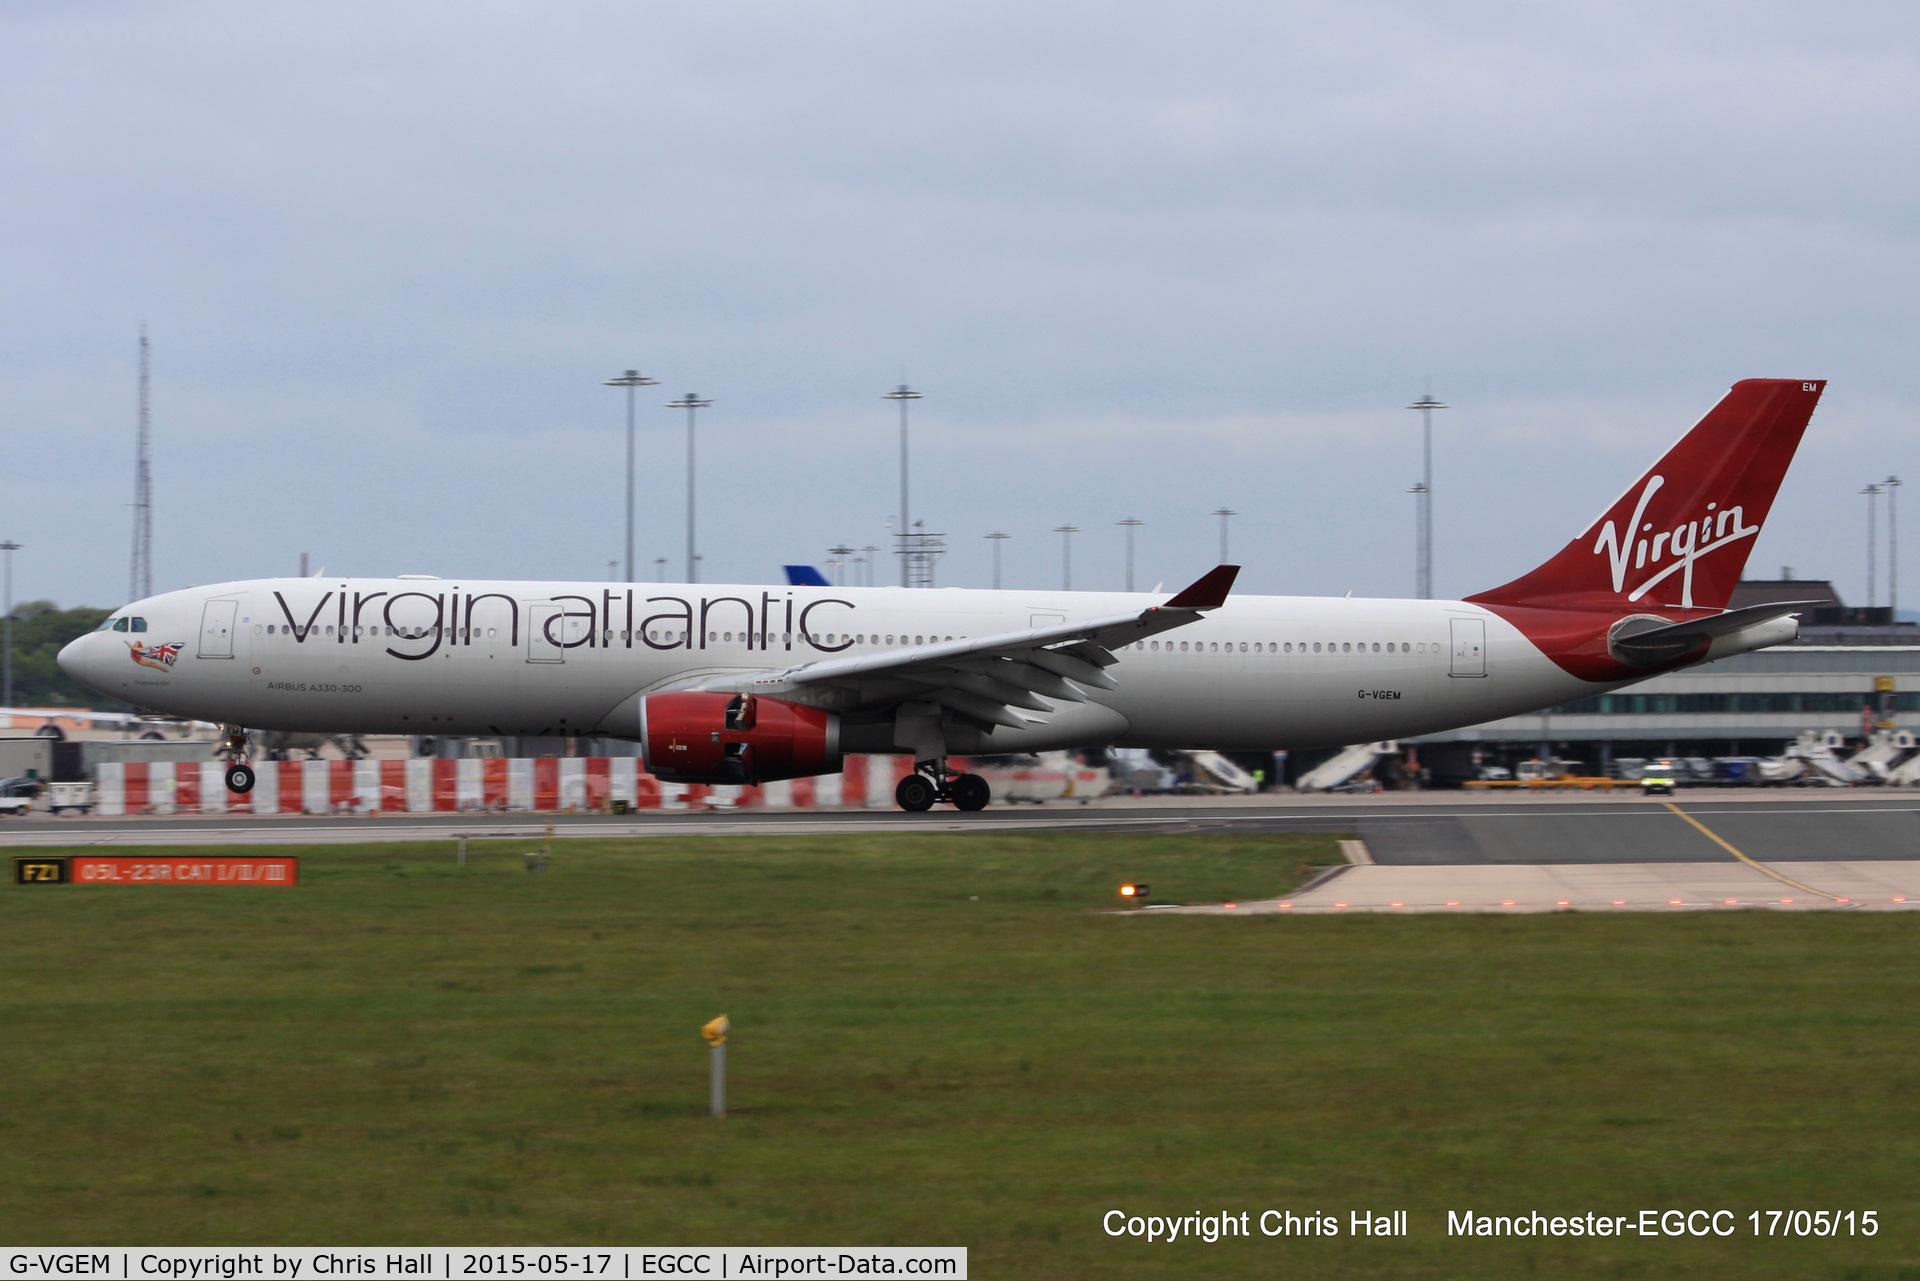 G-VGEM, 2011 Airbus A330-343X C/N 1215, Virgin Atlantic